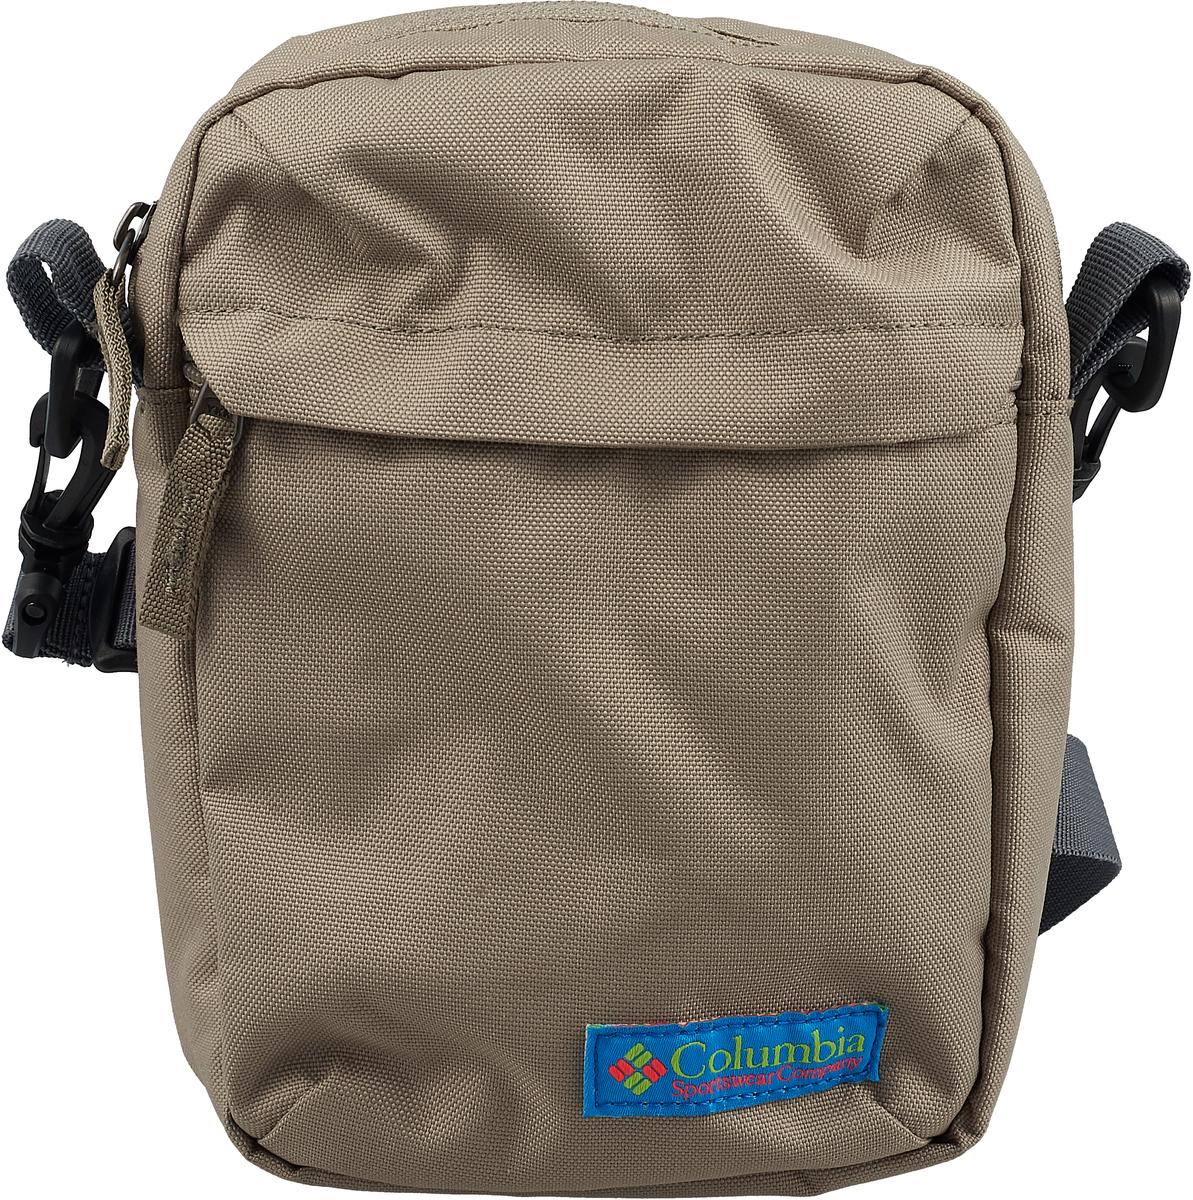 Сумка на плечо Columbia Urban Uplift Side Bag, цвет: бежевый, 2 л. 1724821-221